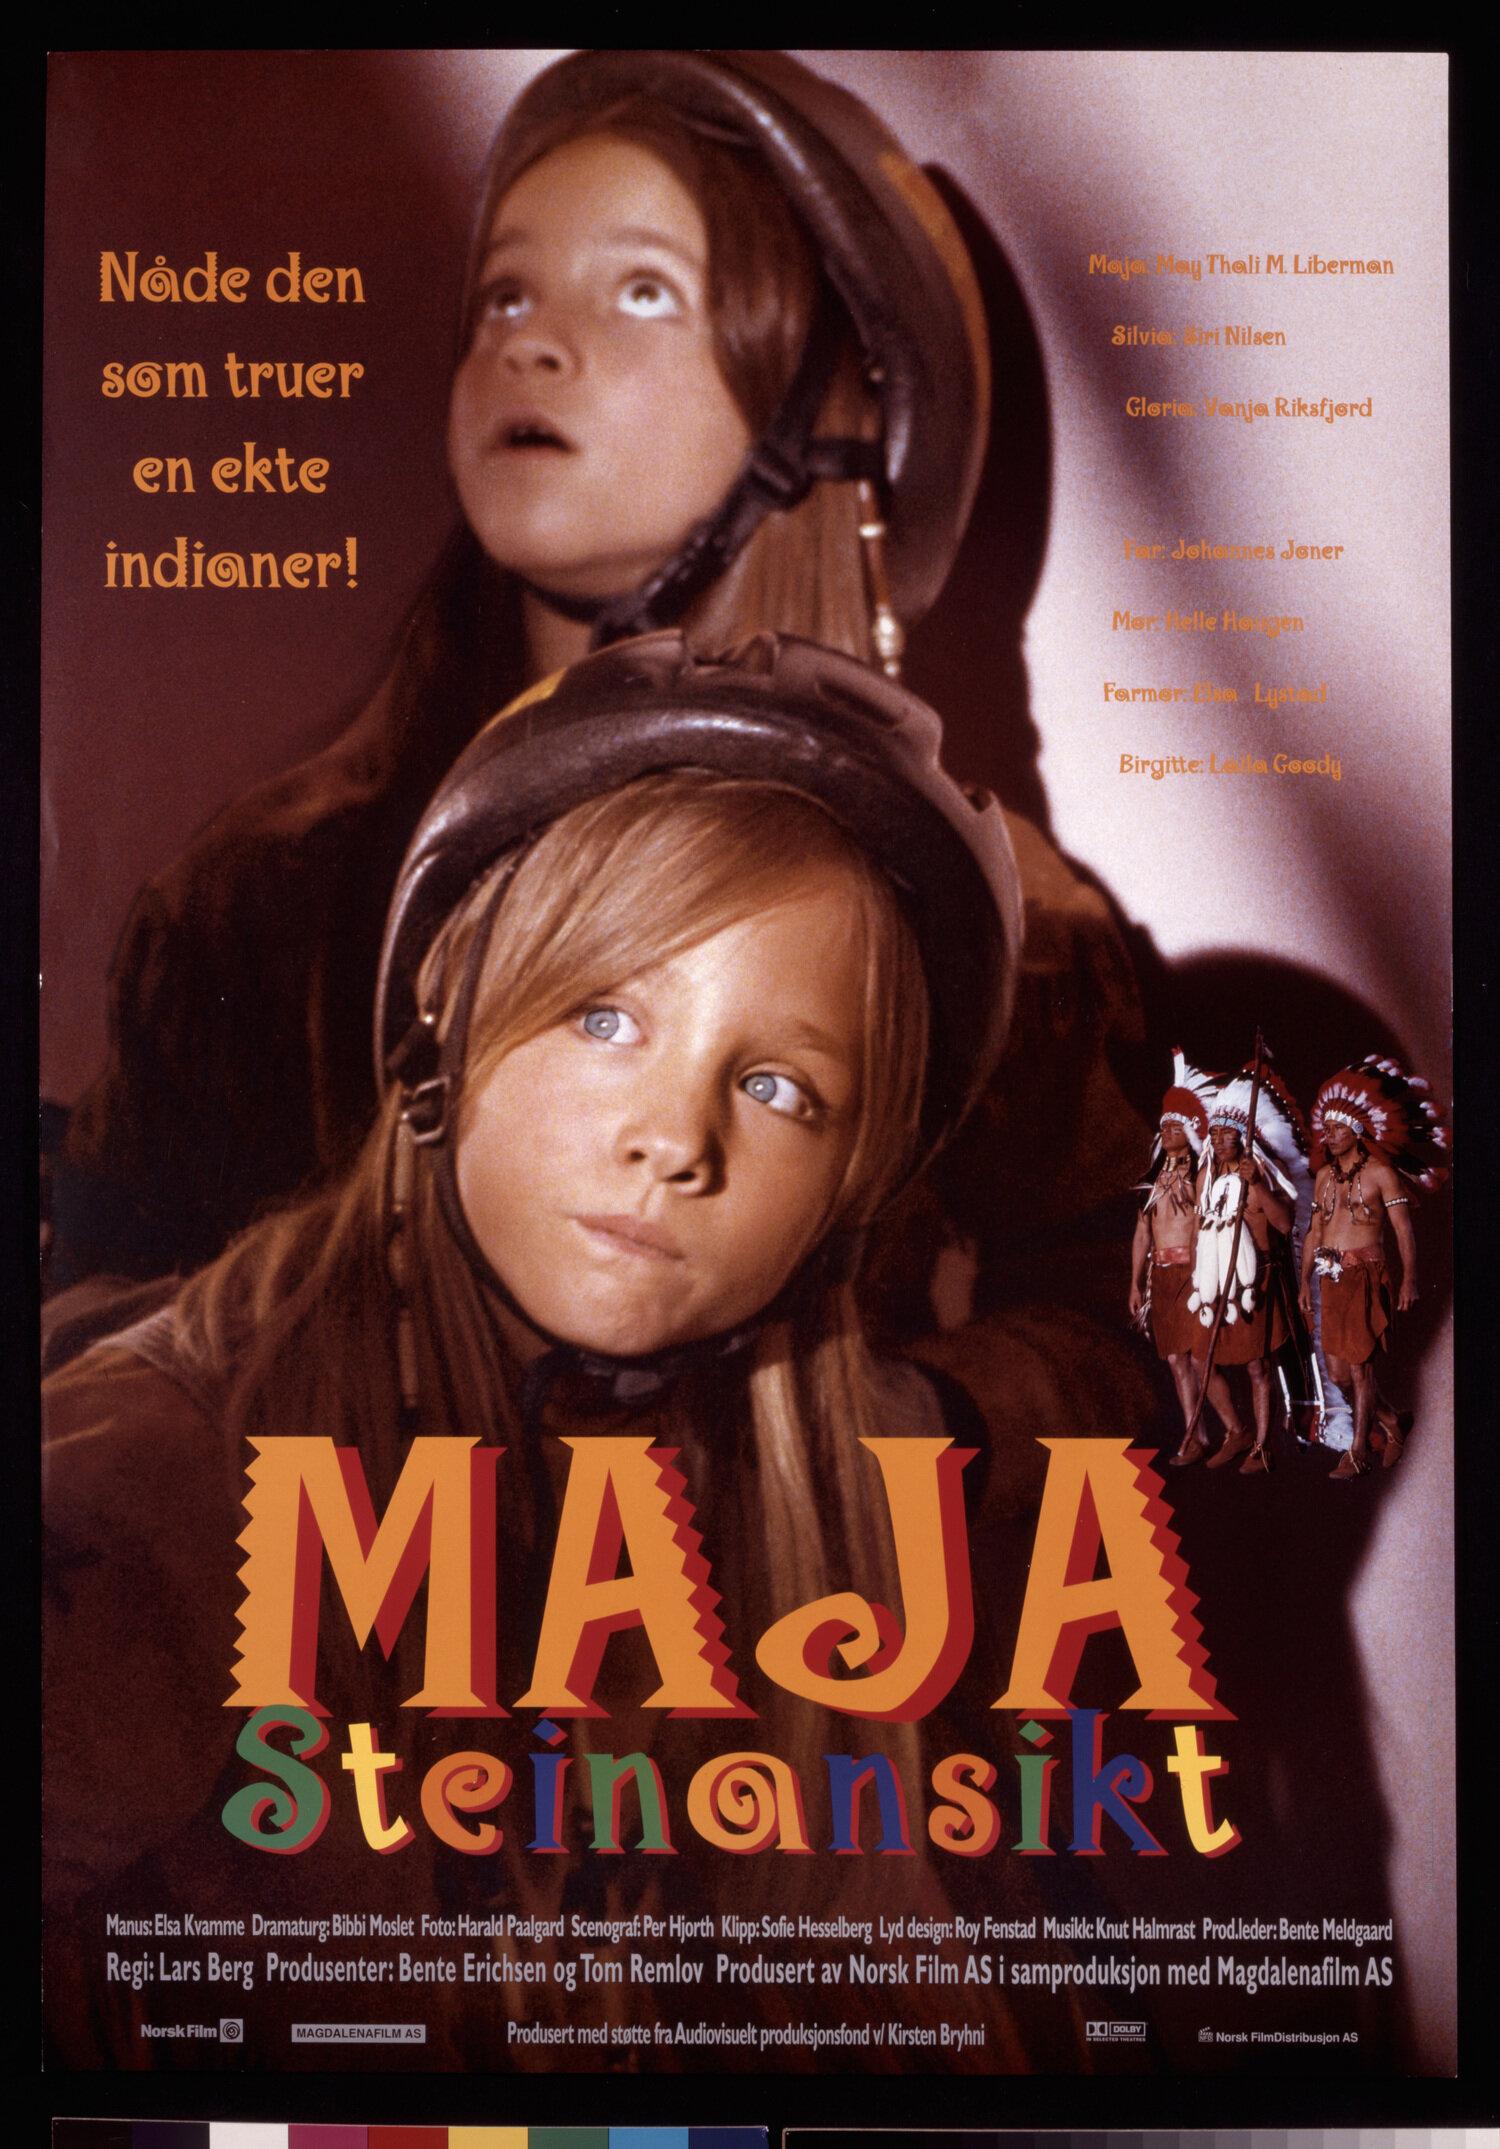 Maja+Steinansikt_plakat.jpg